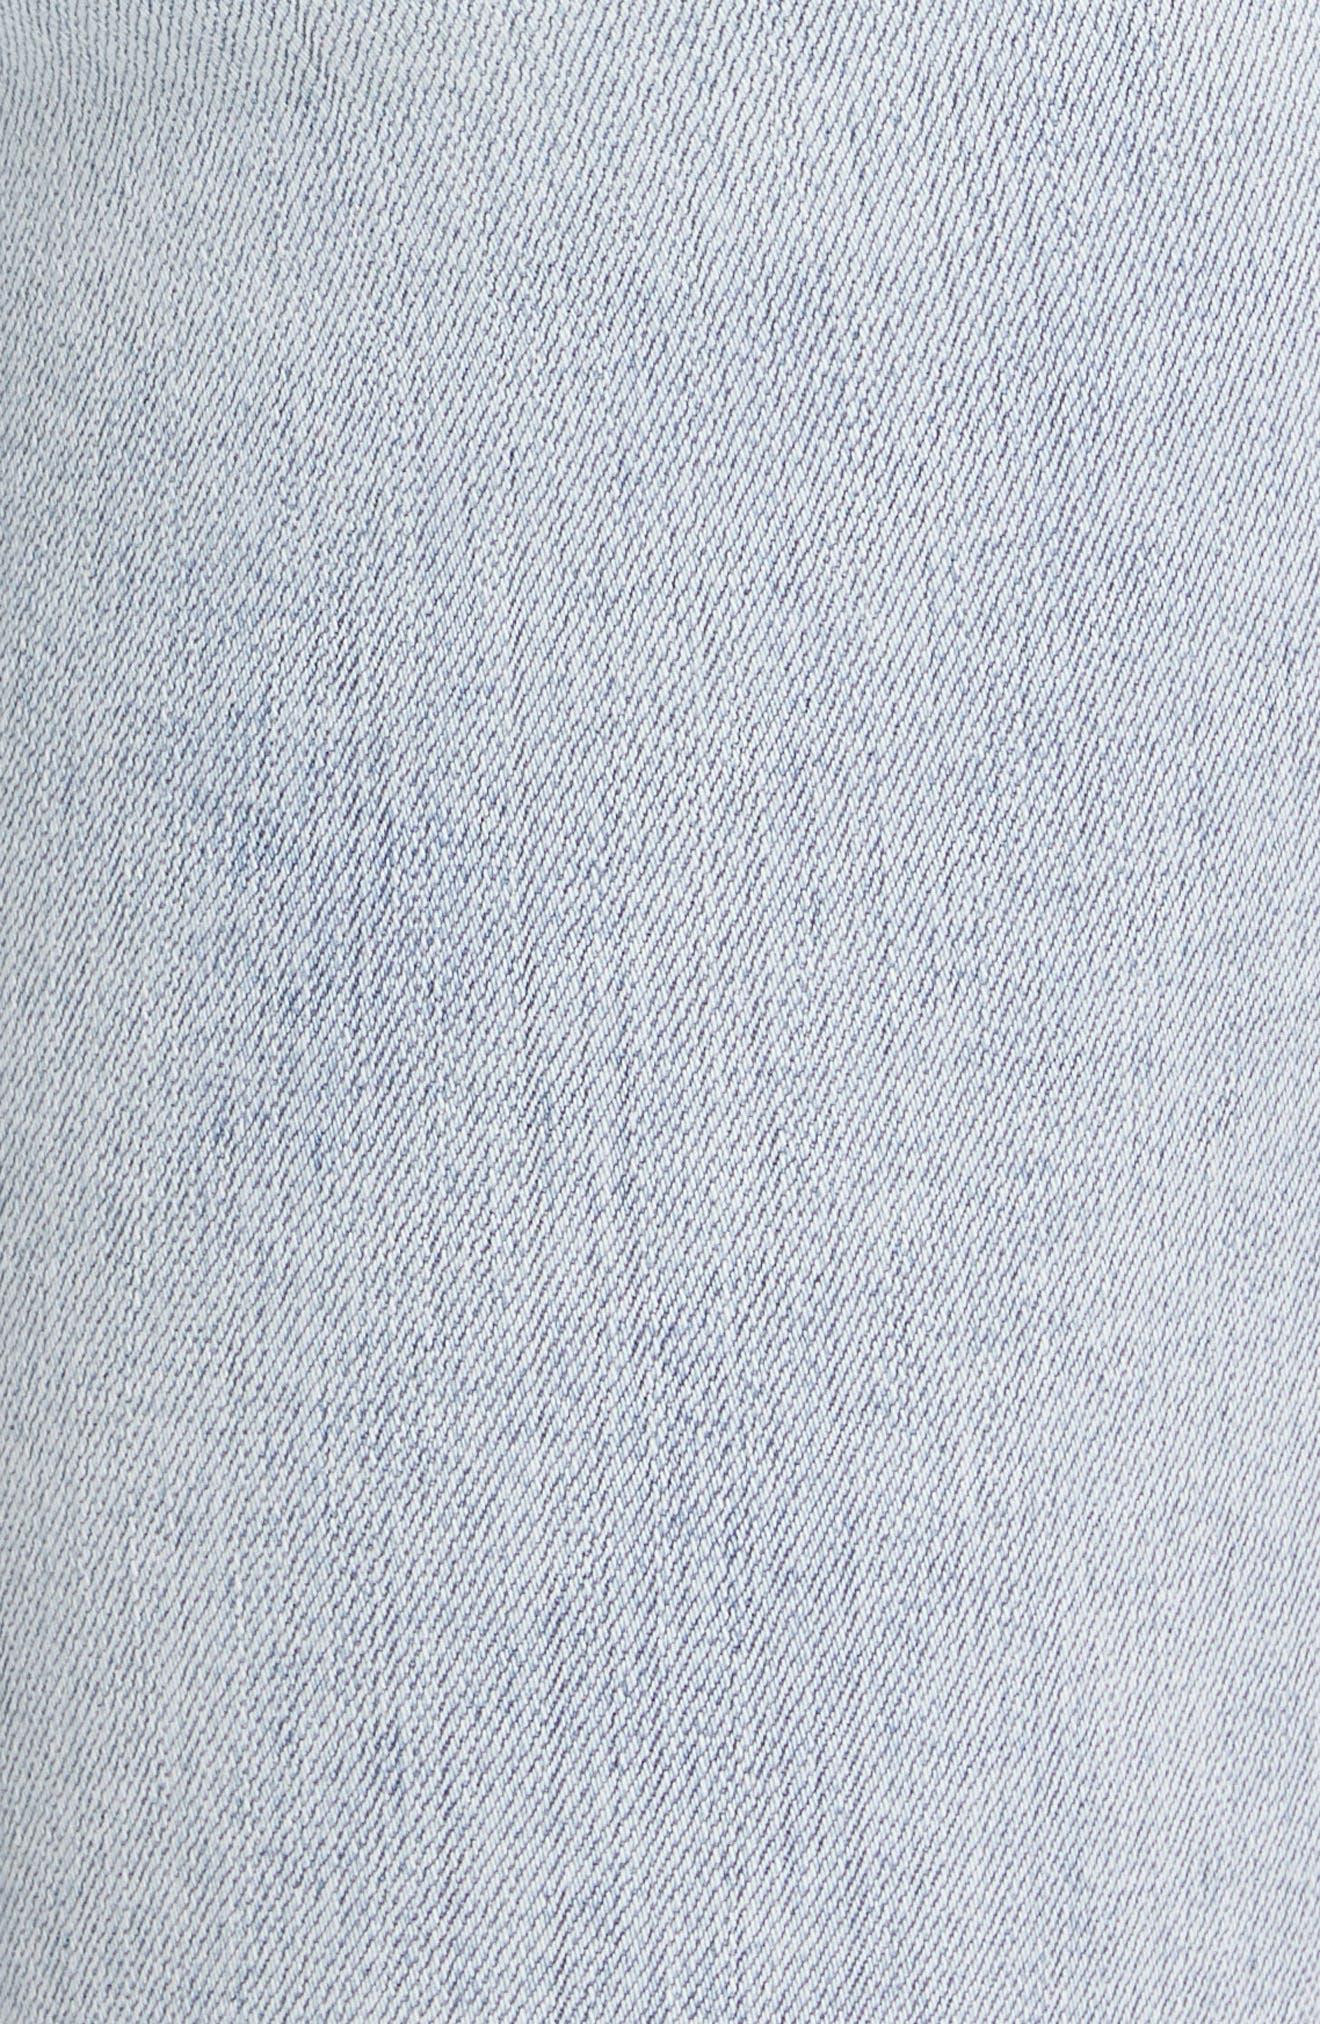 RAG & BONE,                             JEAN Ripped Ankle Skinny Jeans,                             Alternate thumbnail 6, color,                             LYNN W HOLES